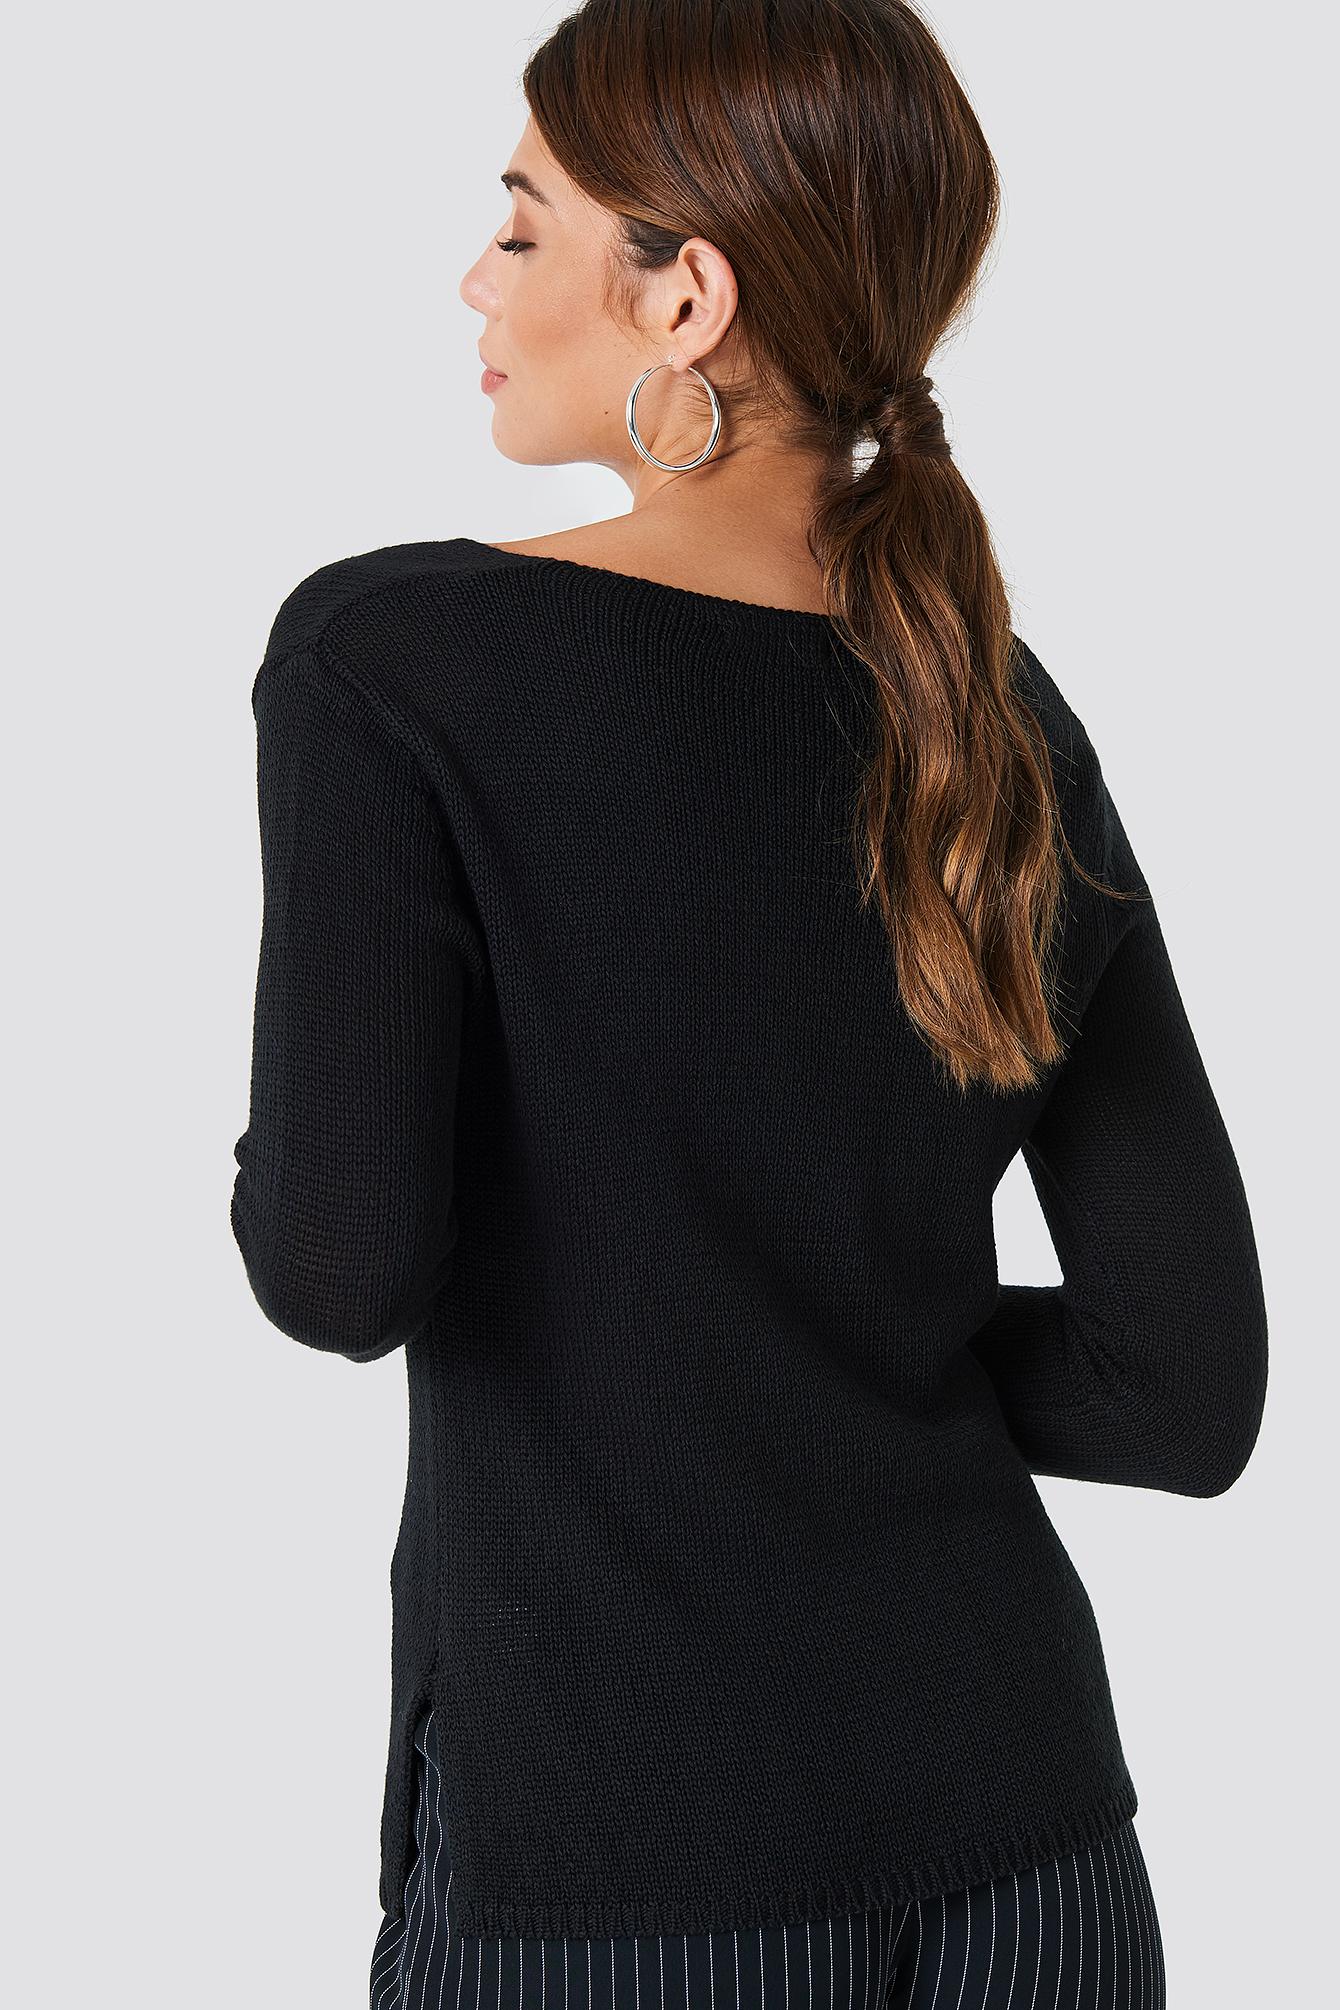 Ninni V-neck Knit NA-KD.COM